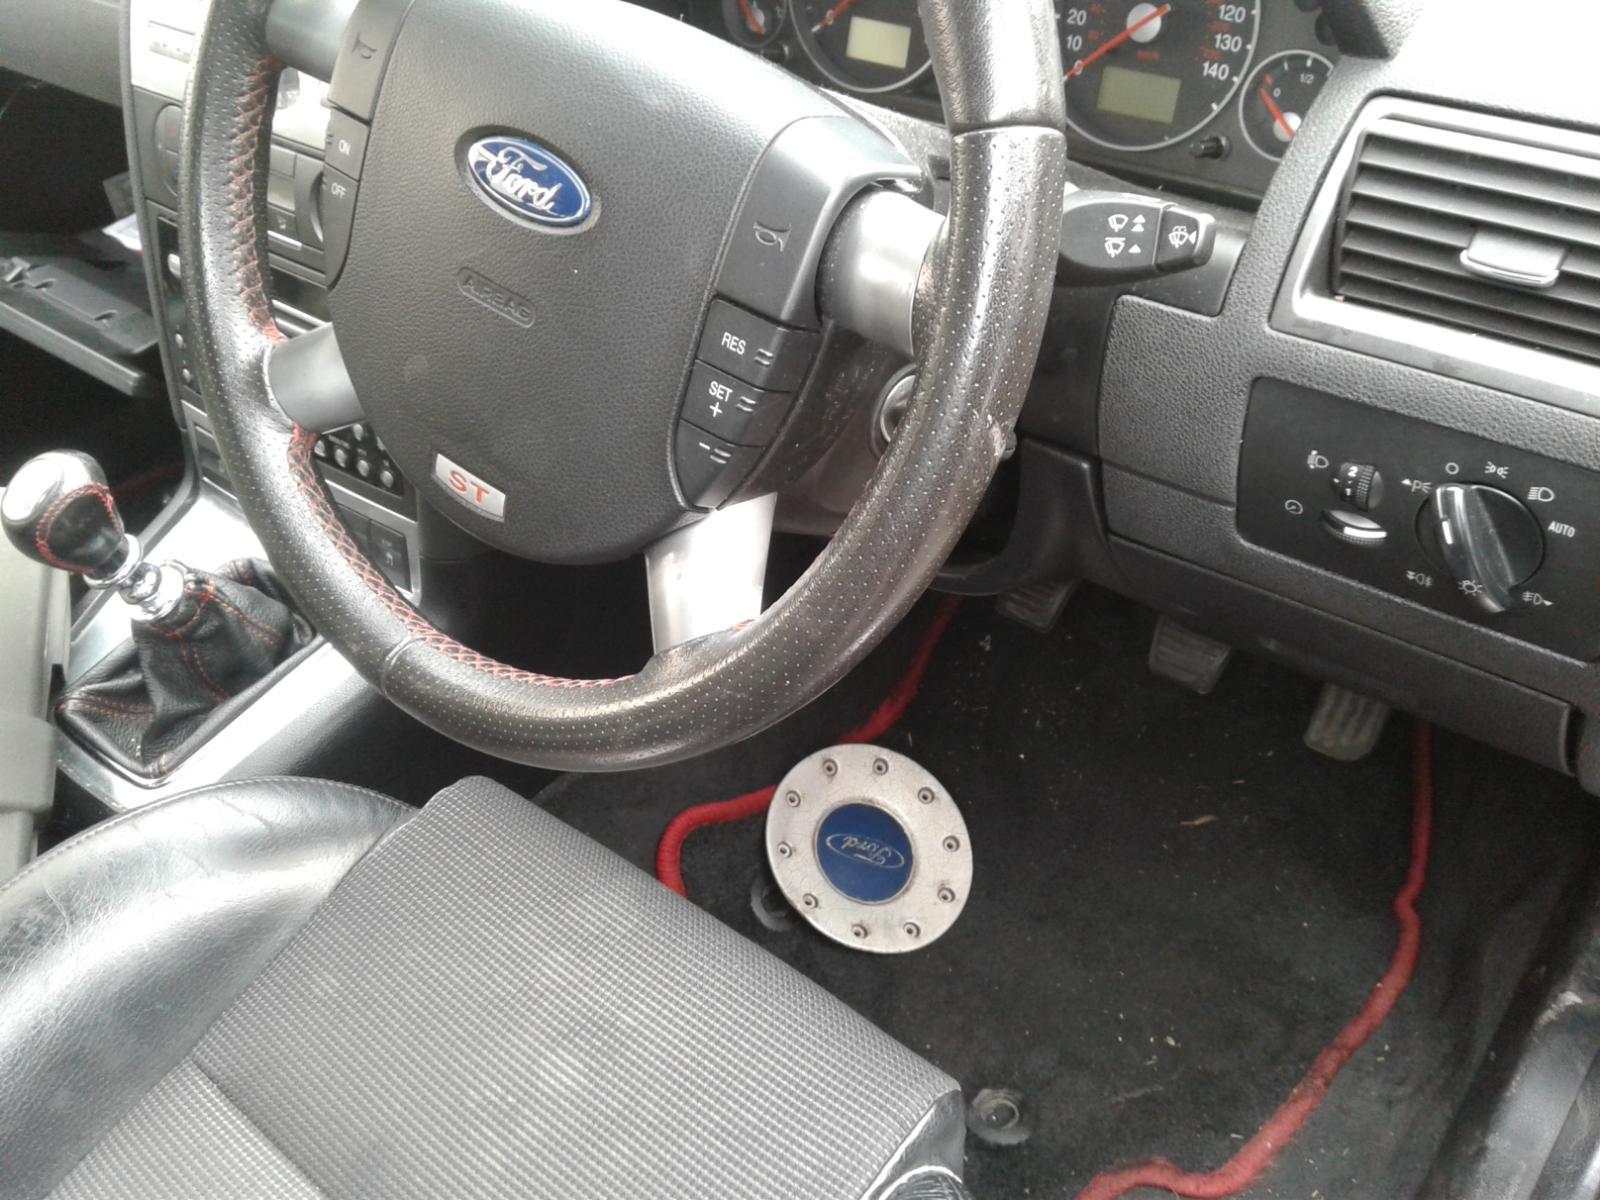 View Auto part FORD MONDEO 2006 5 Door Hatchback